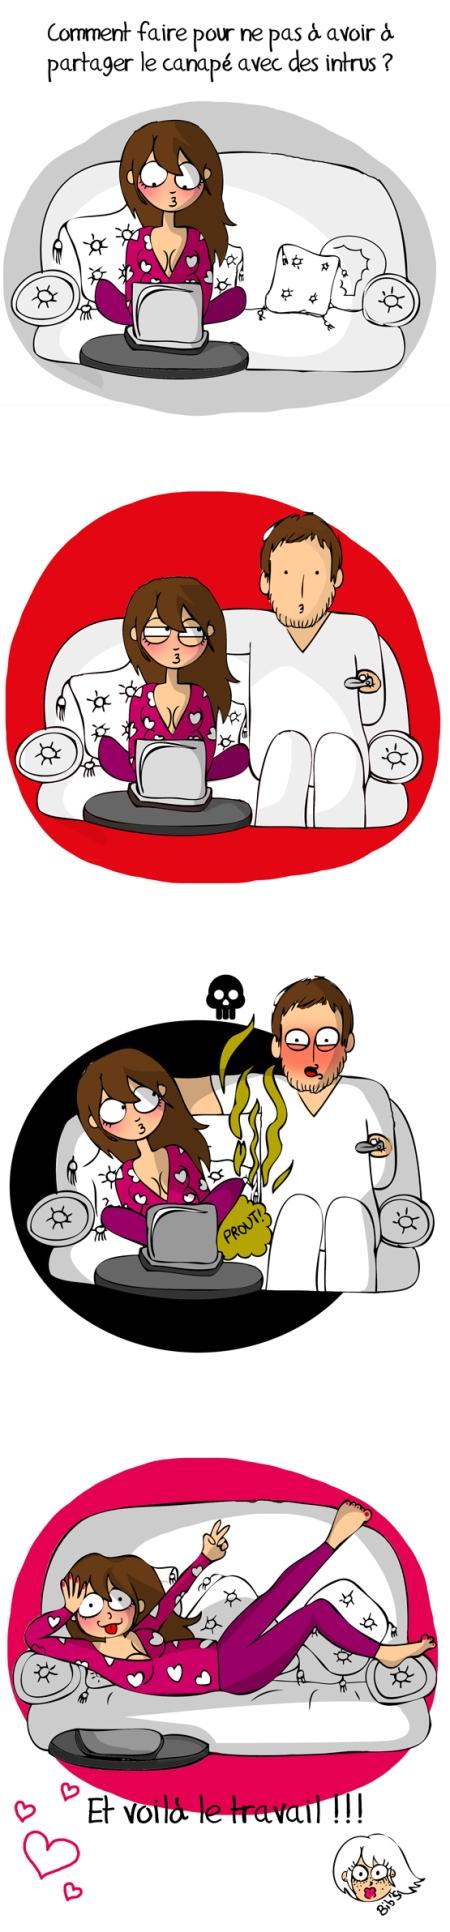 Qui veut prendre sa place, Comic strip, bd, illustration humour, blog girly,